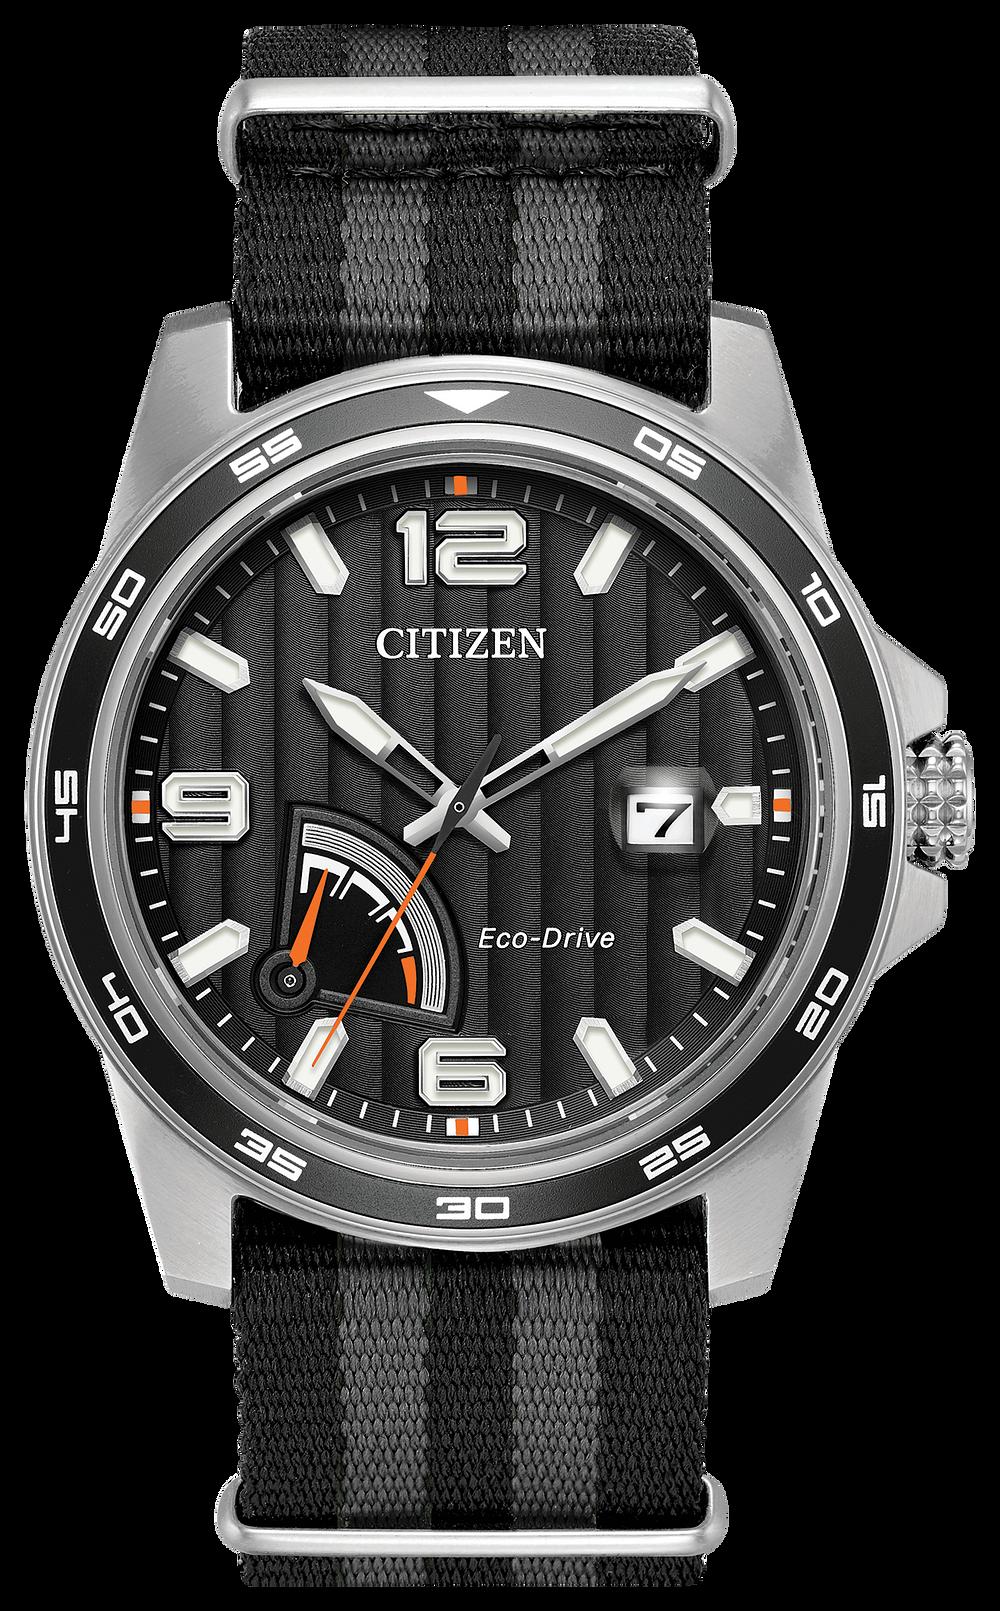 7368aebb3f14a PRT - Men s Eco-Drive AW7030-06E Black Tone Steel Case Watch